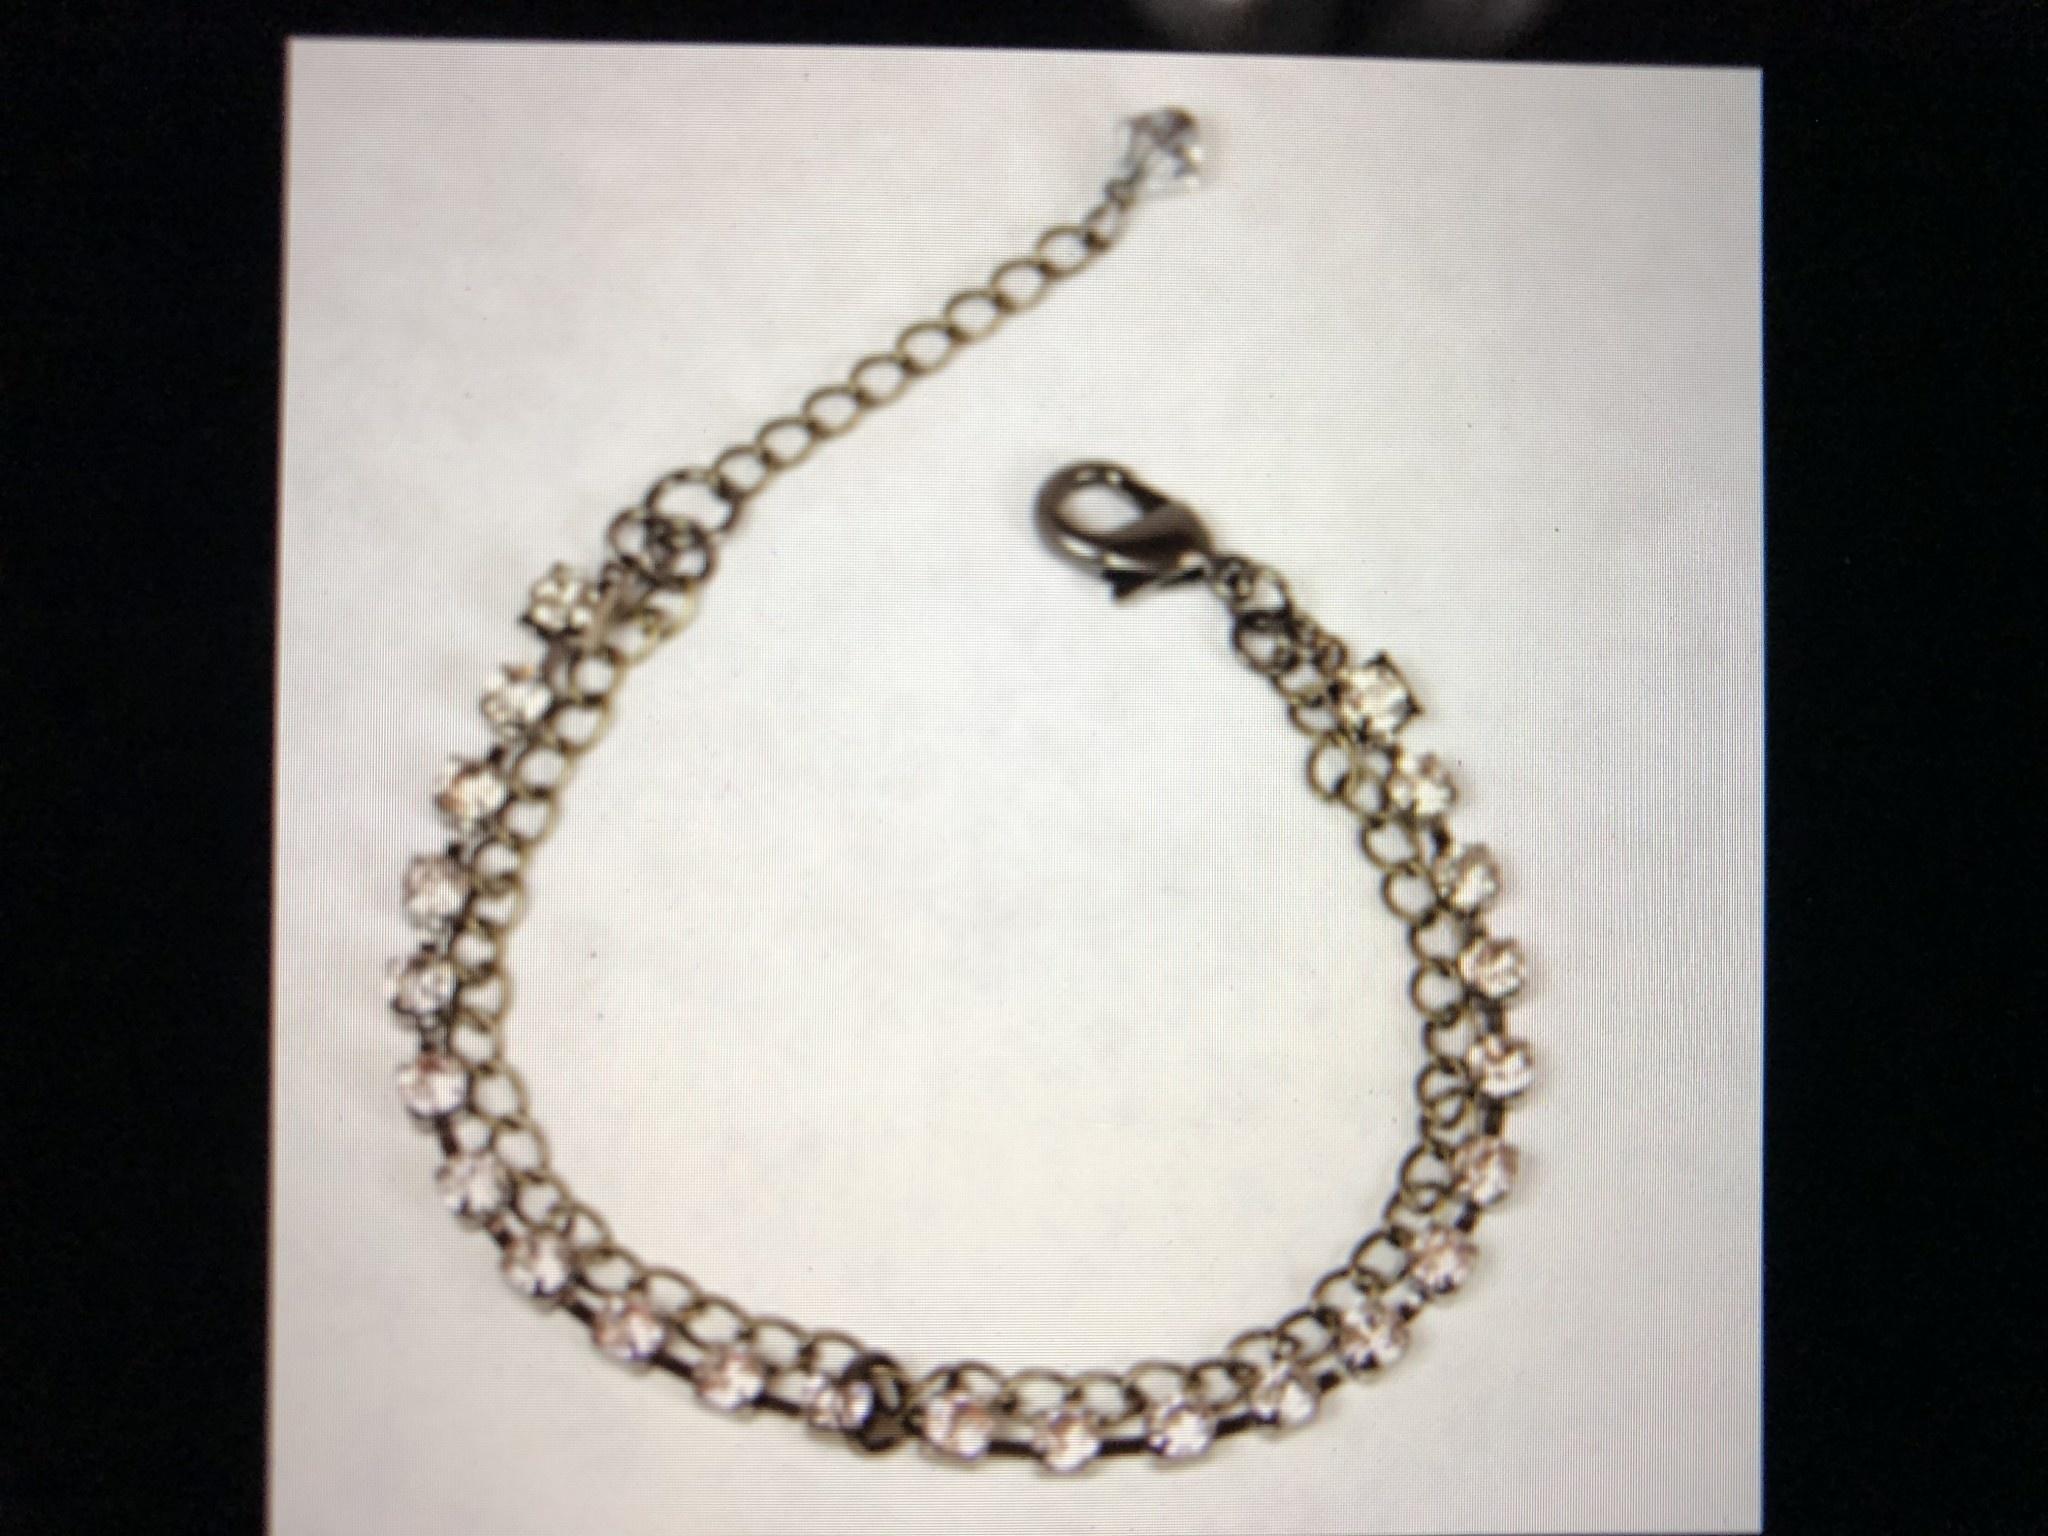 cool water jewelry BC26-50 Bracelet: MT Millworks-Dbl Strand Curb Chain/Rhine